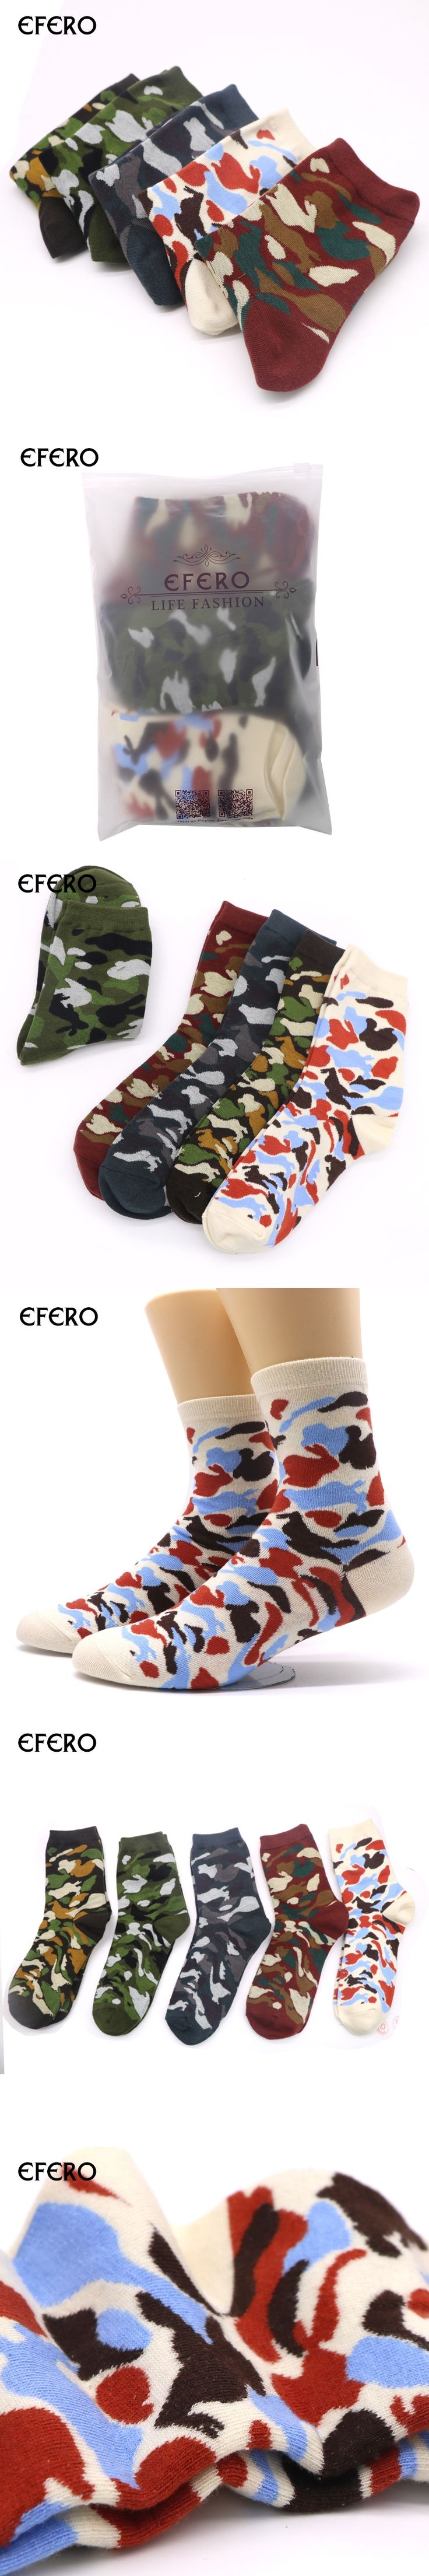 efero 1pair New Autumn And Winter Men's Socks Meias Cotton Men Novelty Socks Art Classic Camouflage Tube Men Socks Calcetines